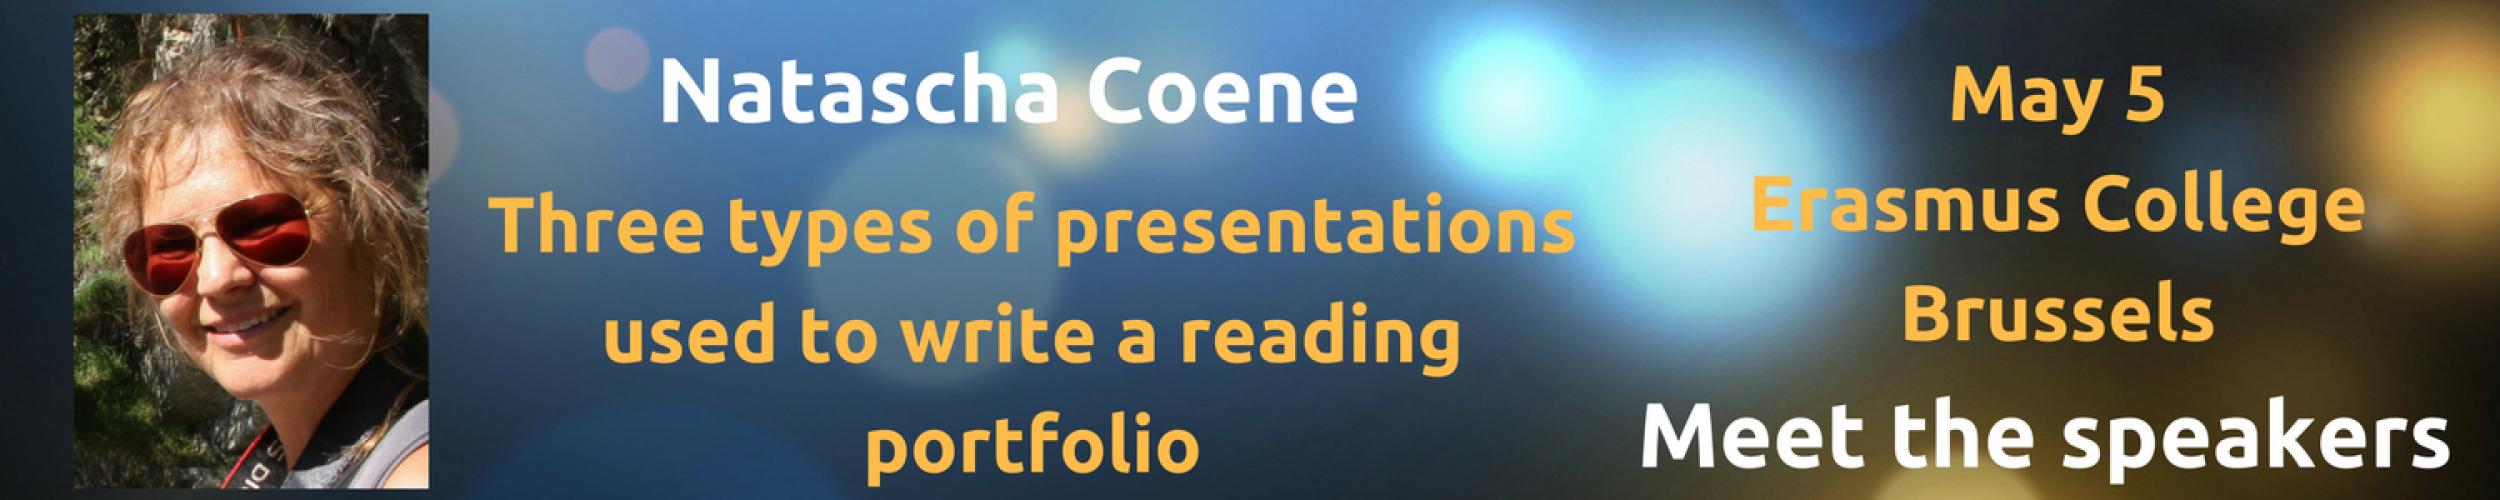 Meet The Speakers: Natascha Coene